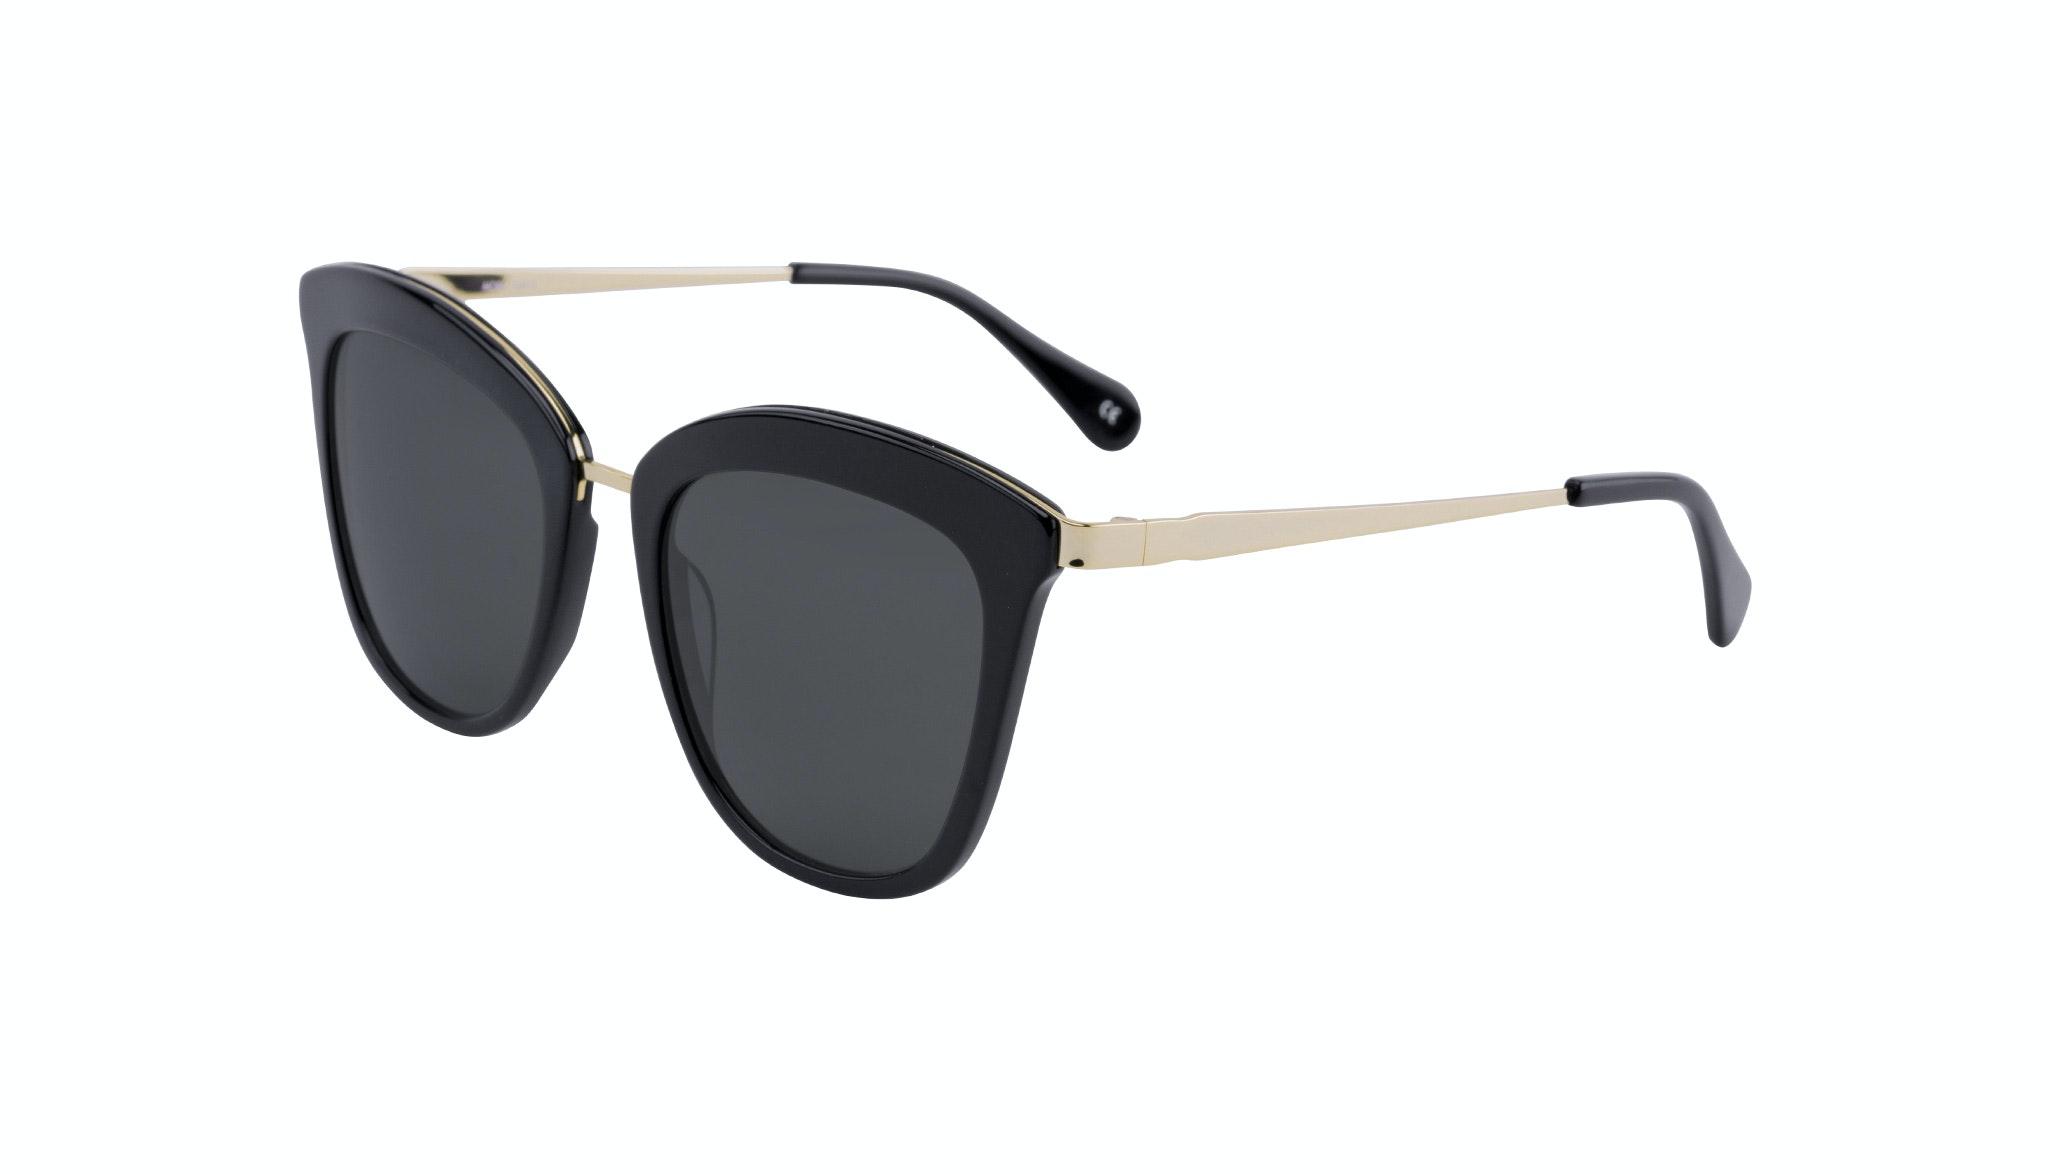 Affordable Fashion Glasses Rectangle Square Sunglasses Women More Onyx Tilt